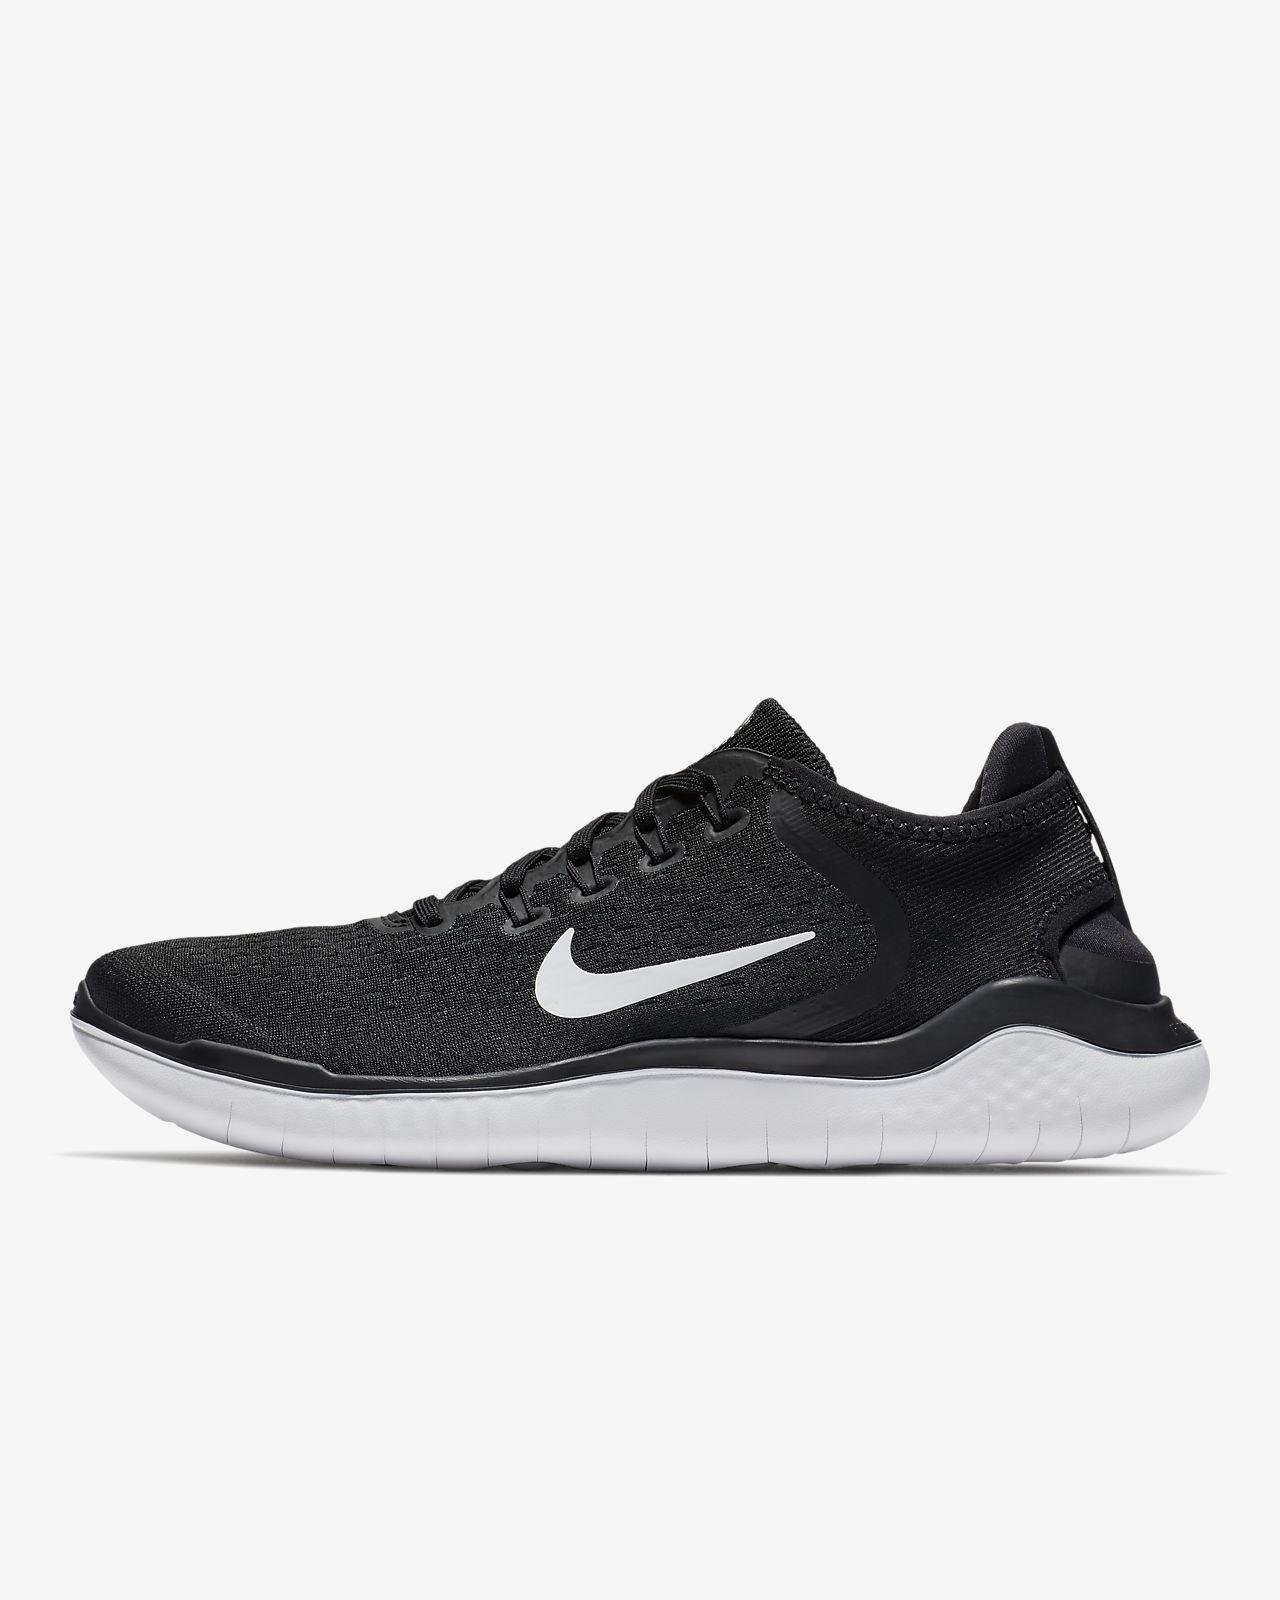 Neuheiten Grau Gelb Weiß Herren Schuhe Nike Free Run 5.0 V2